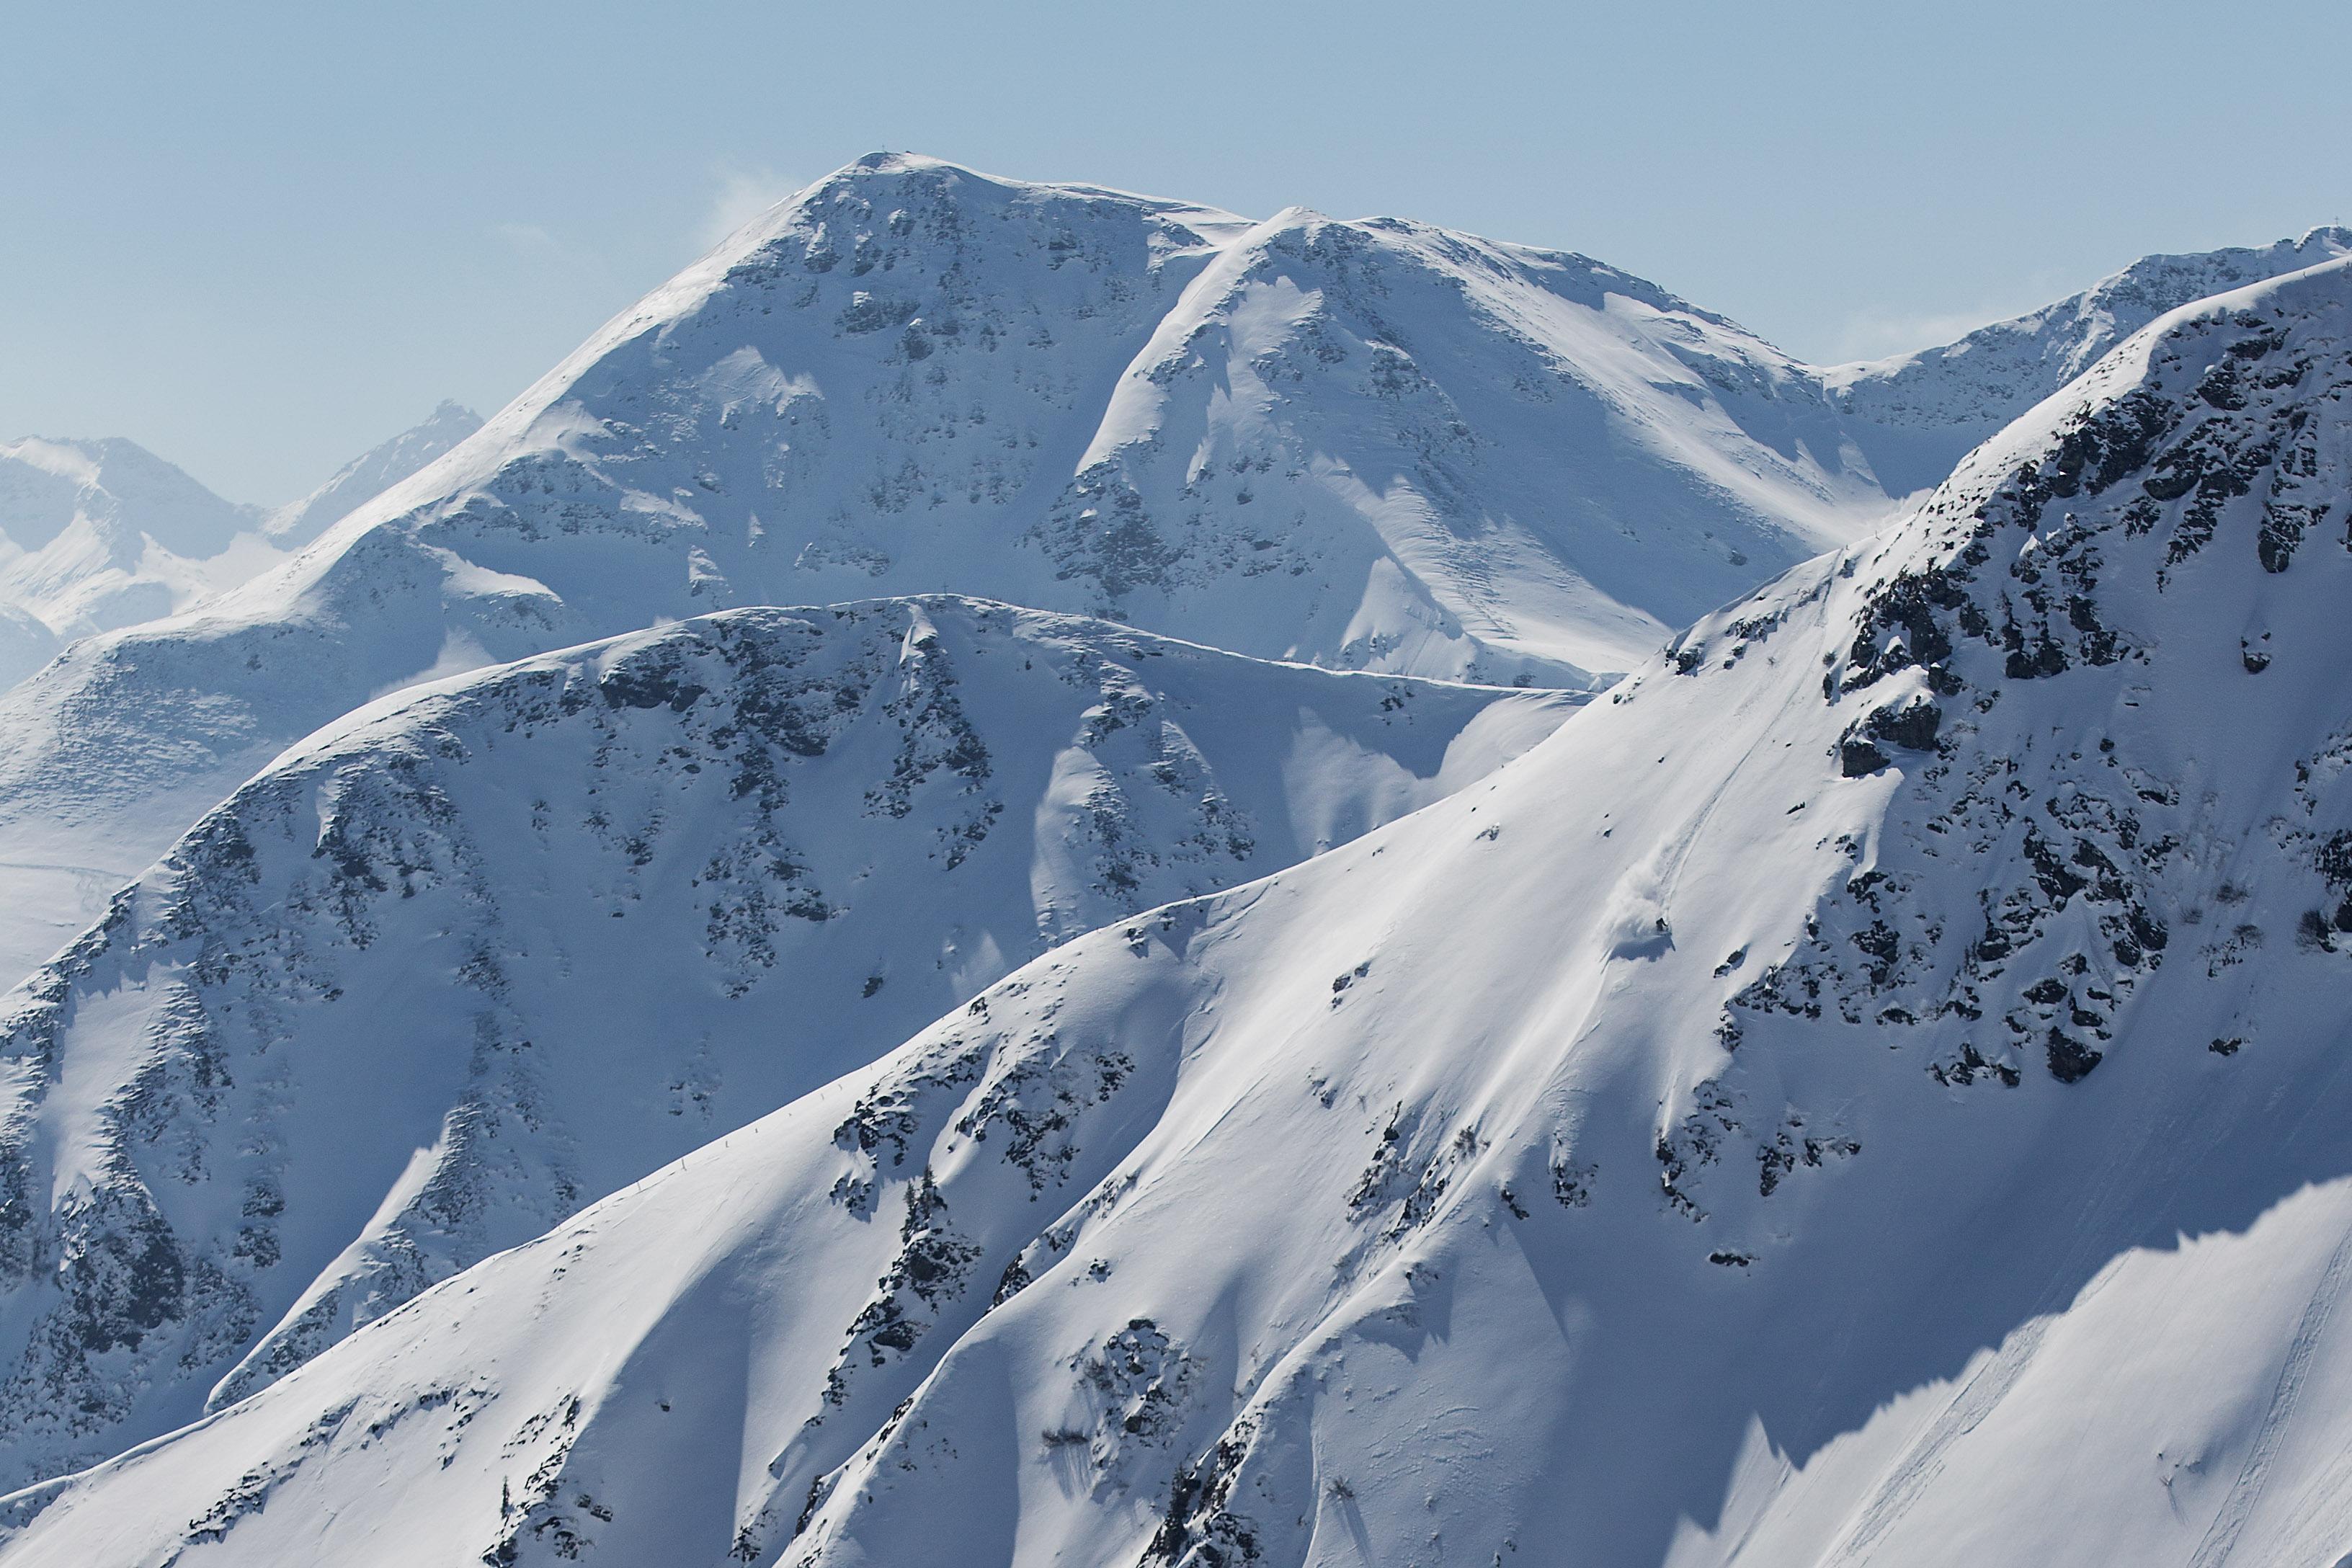 Skicircus Saalbach Hinterglemm Leogang, Austria